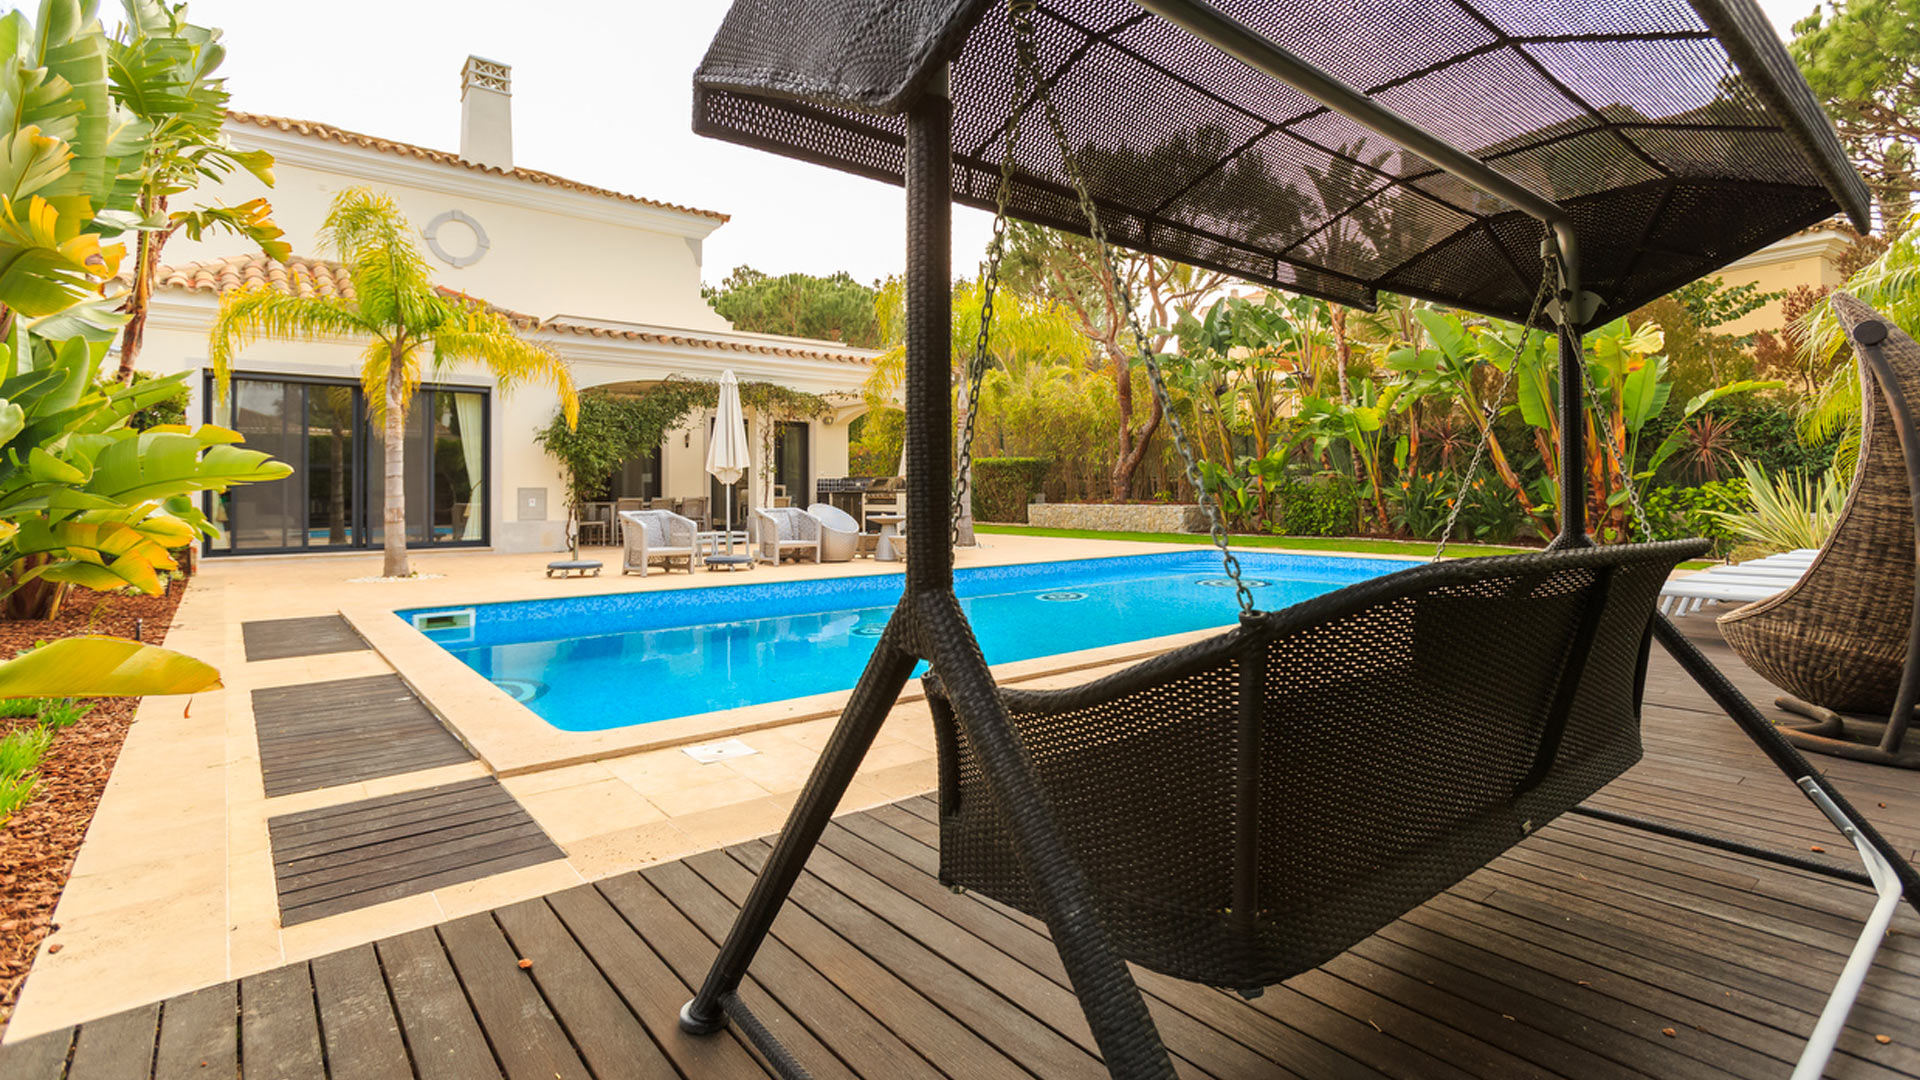 Villa Villa Blue Swirl, Rental in Algarve